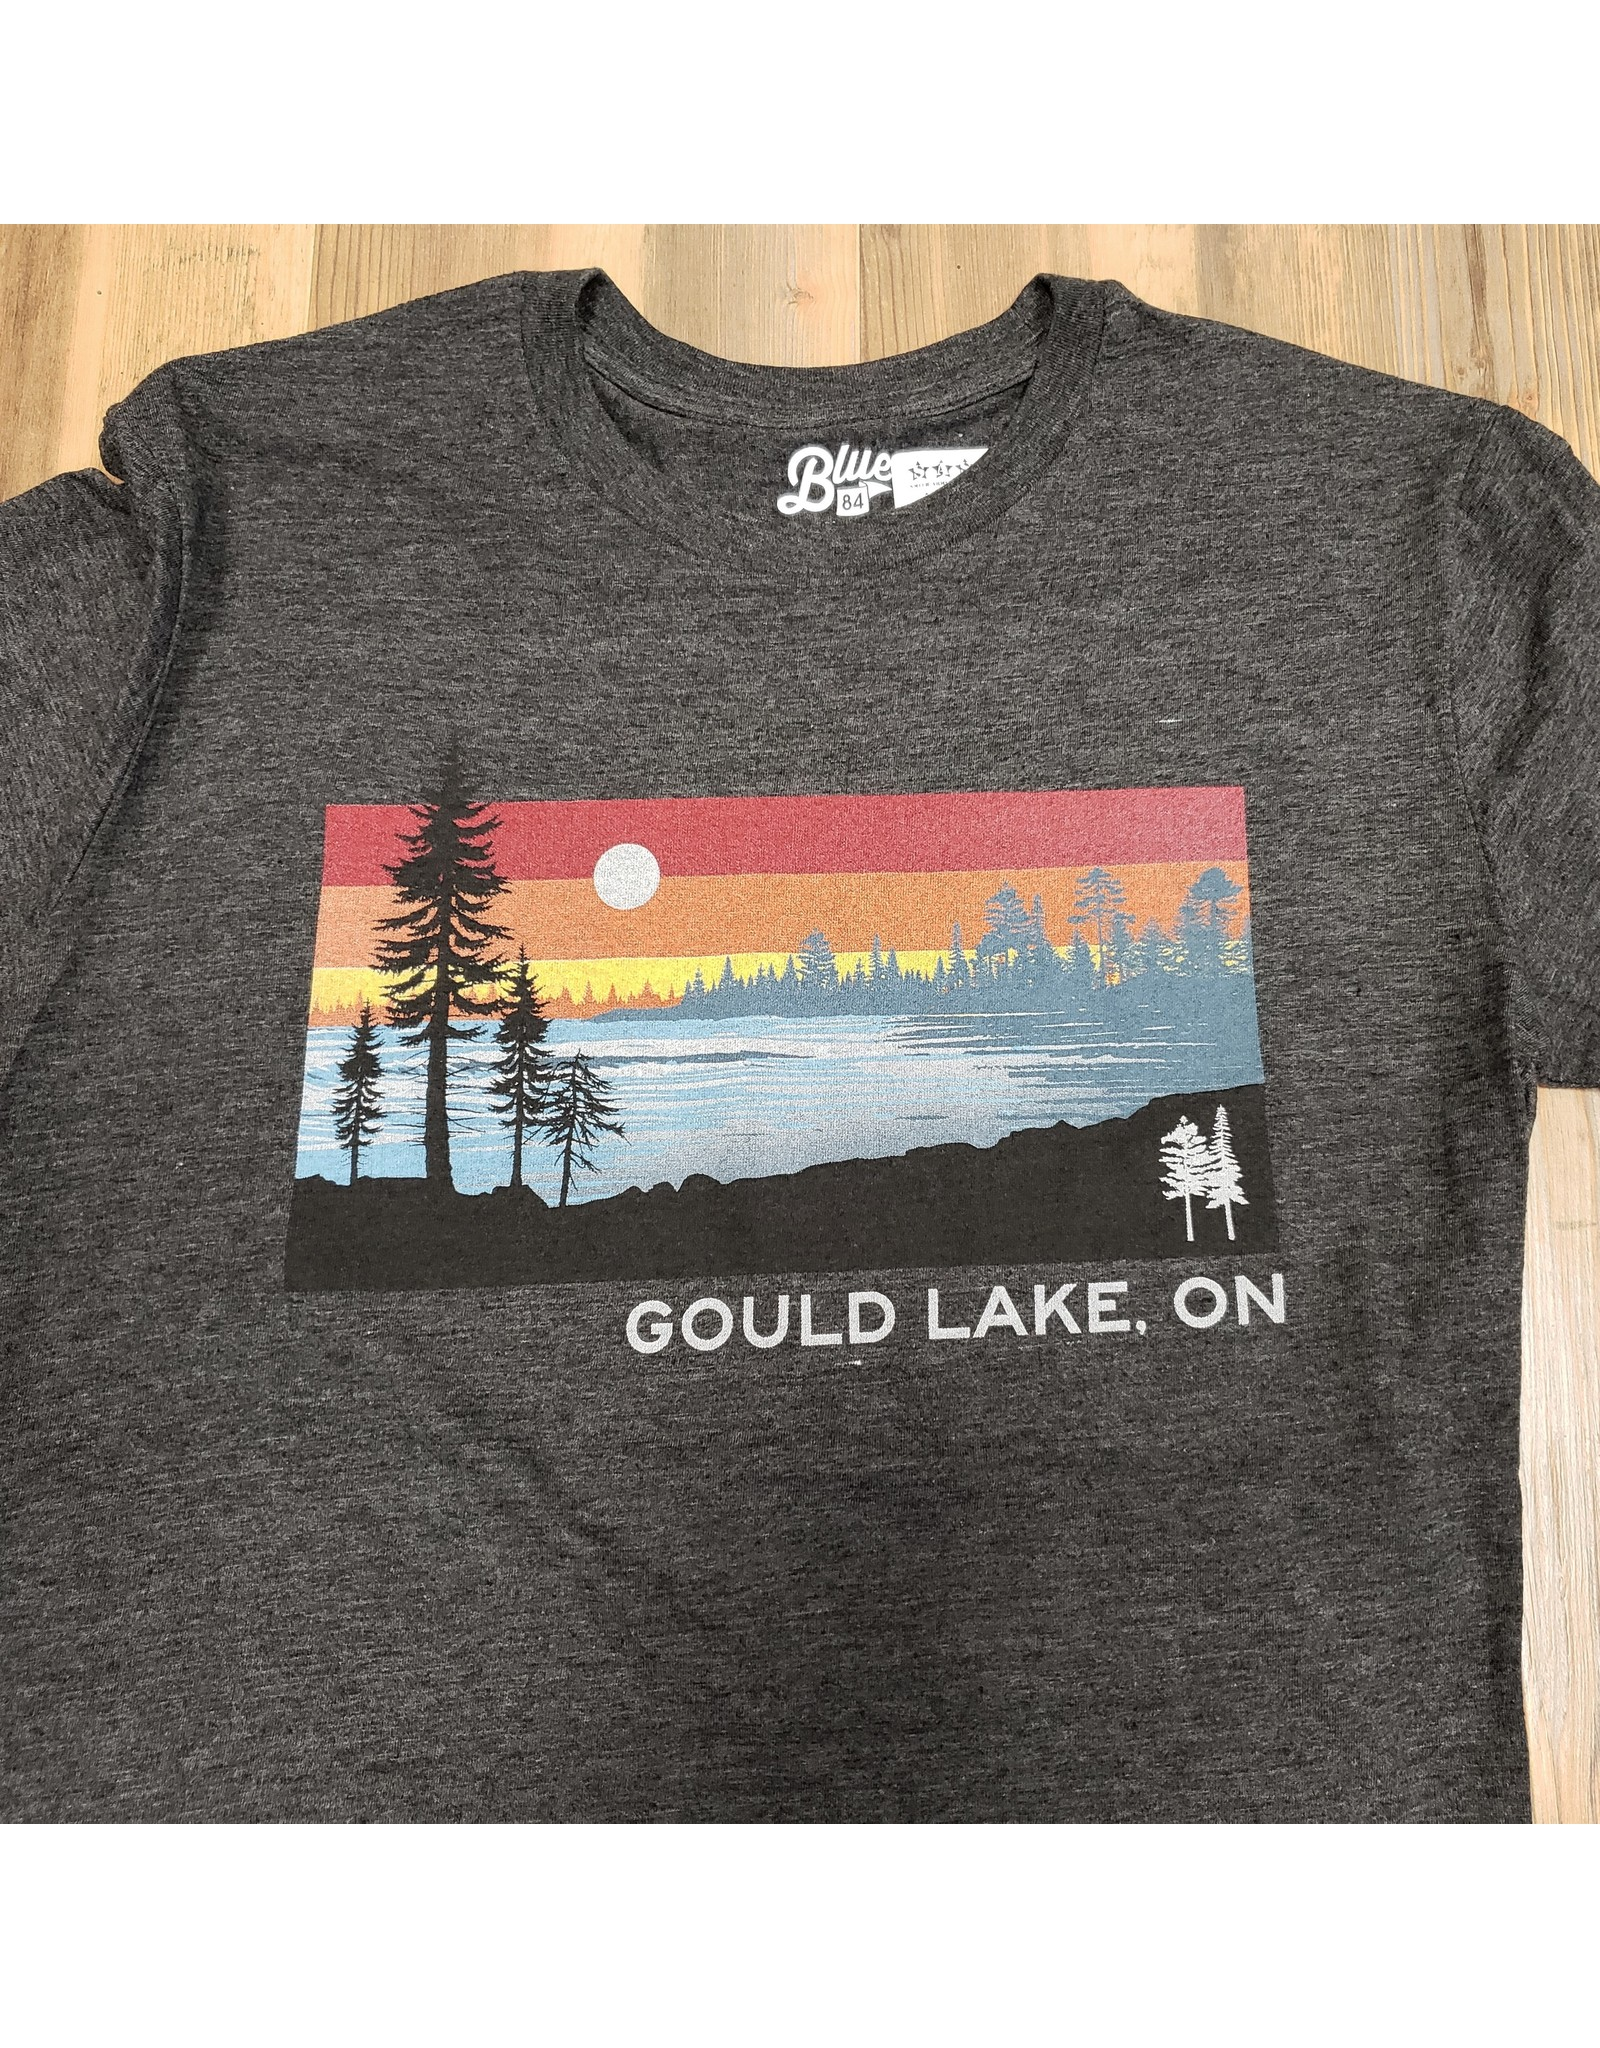 BLUE GOULD LAKE T-SHIRT